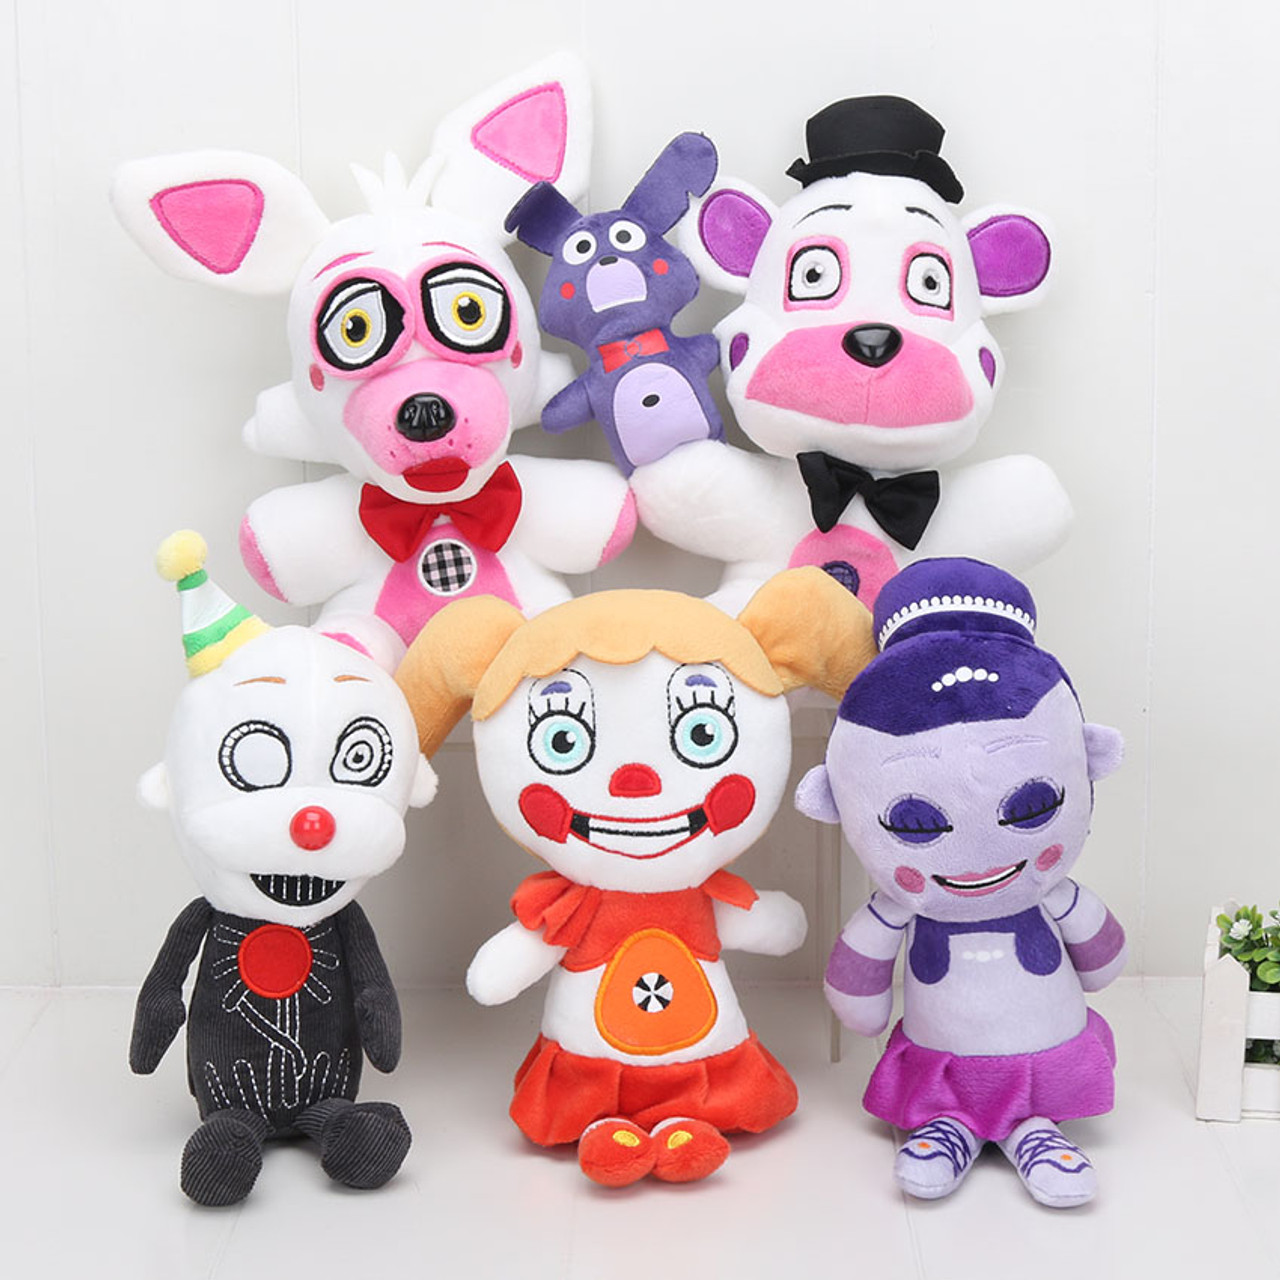 Koala Stuffed Animals Mini, 25 Cm Fnaf Toys Five Nights At Freddy Plush Toy Freddy Bear Foxy Toys Children Gift Toys Onshopdeals Com